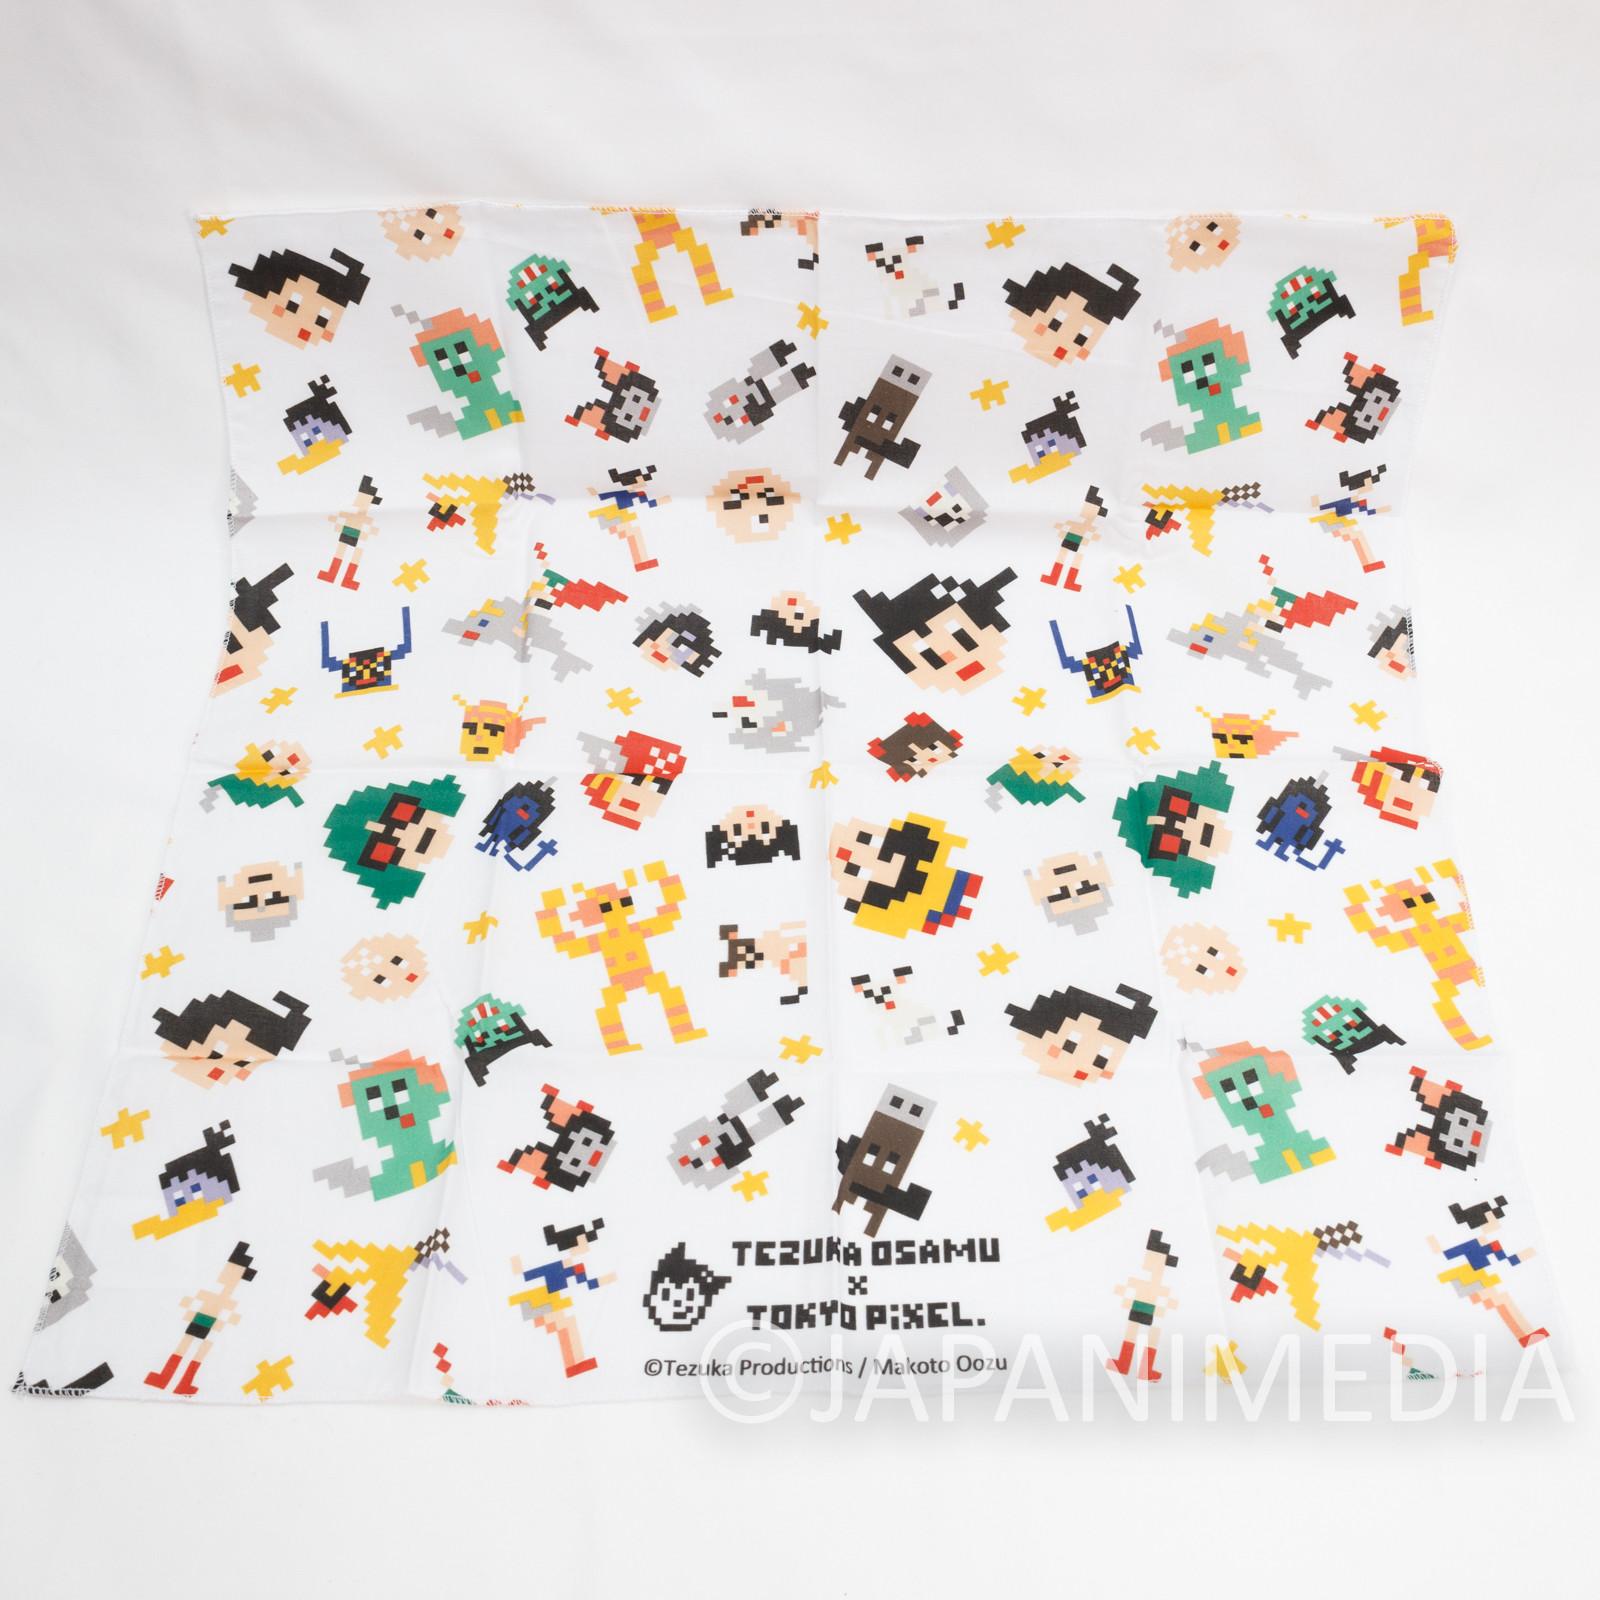 Osamu Tezuka Tokyo Pixel Dot Character Handkerchief 19x19inch #1 JAPAN ANIME